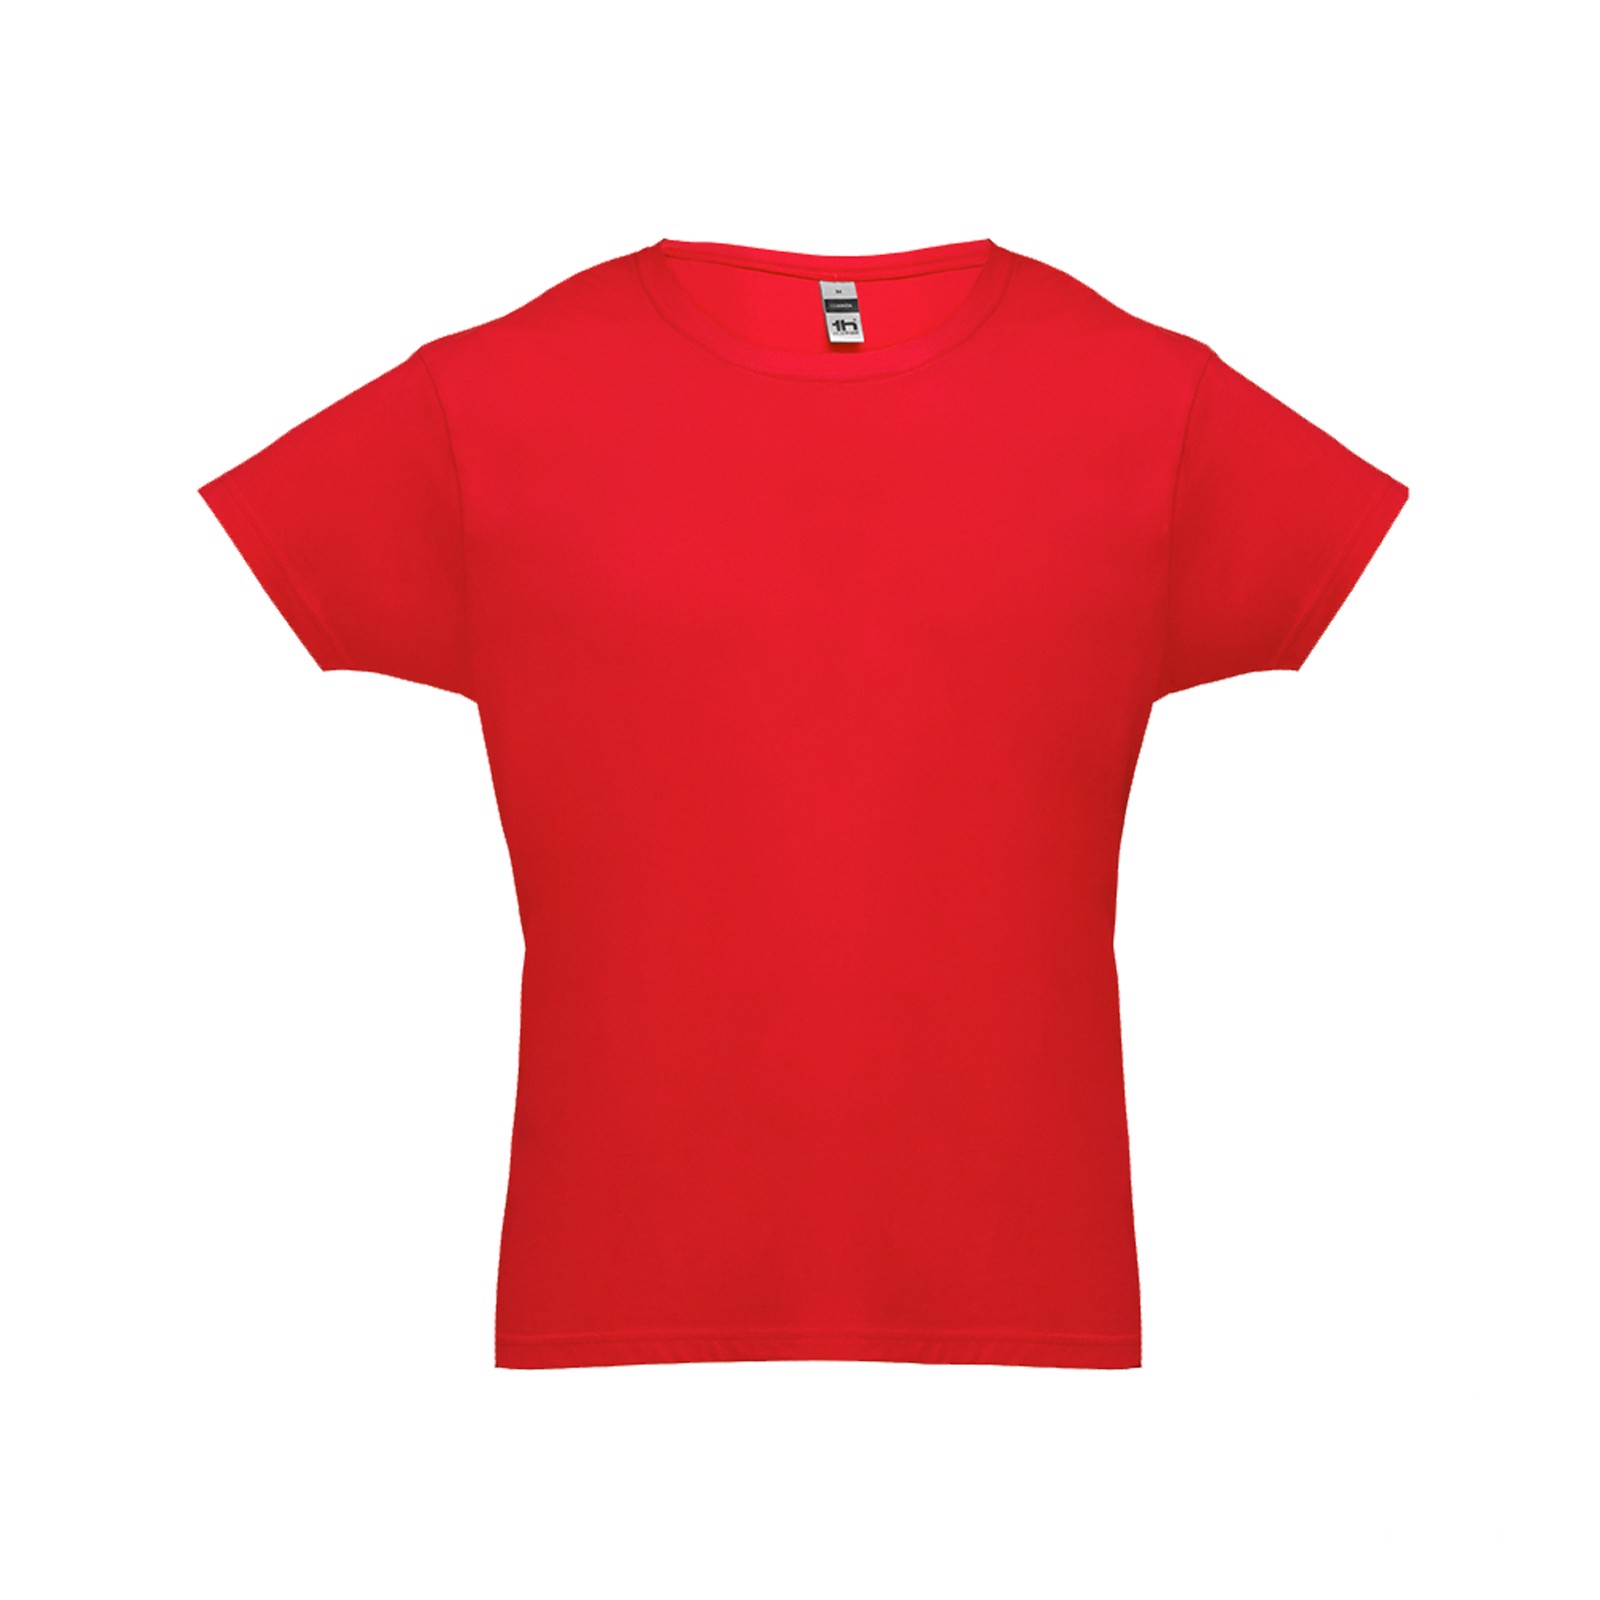 LUANDA. Men's t-shirt - Red / 3XL